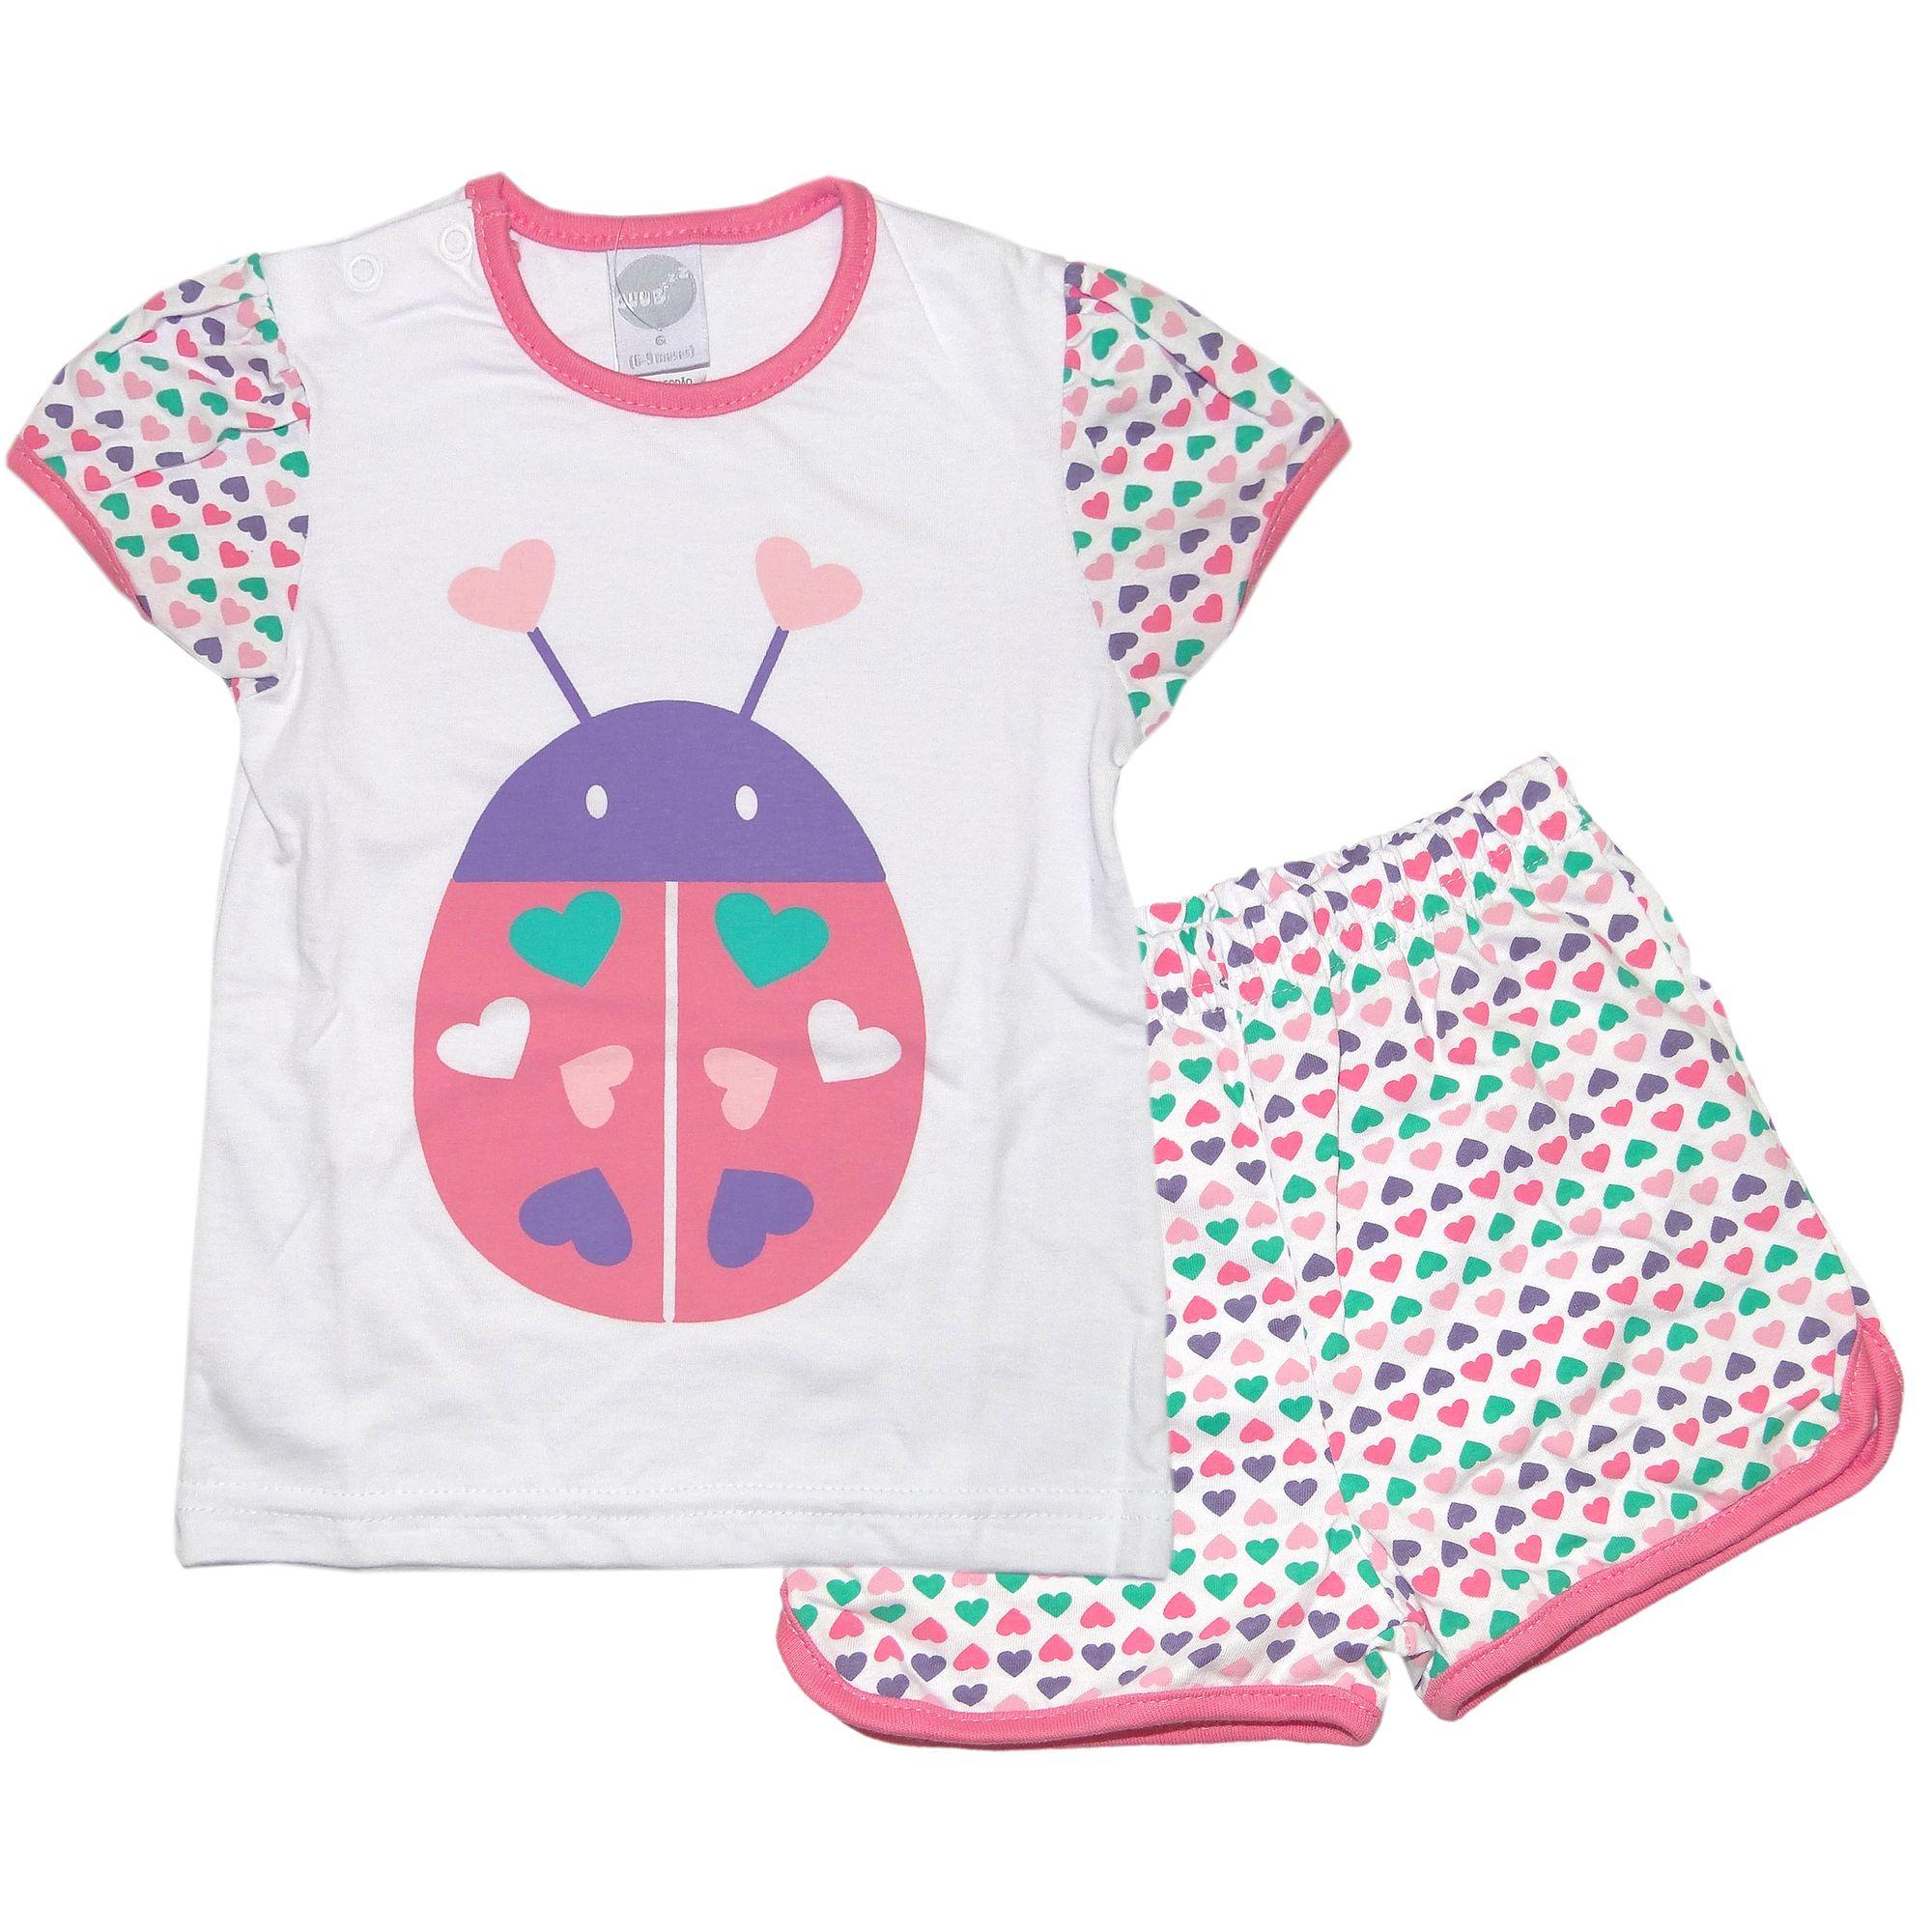 manga curta joaninha rosa club zzz piu piu pijama   camiseta manga